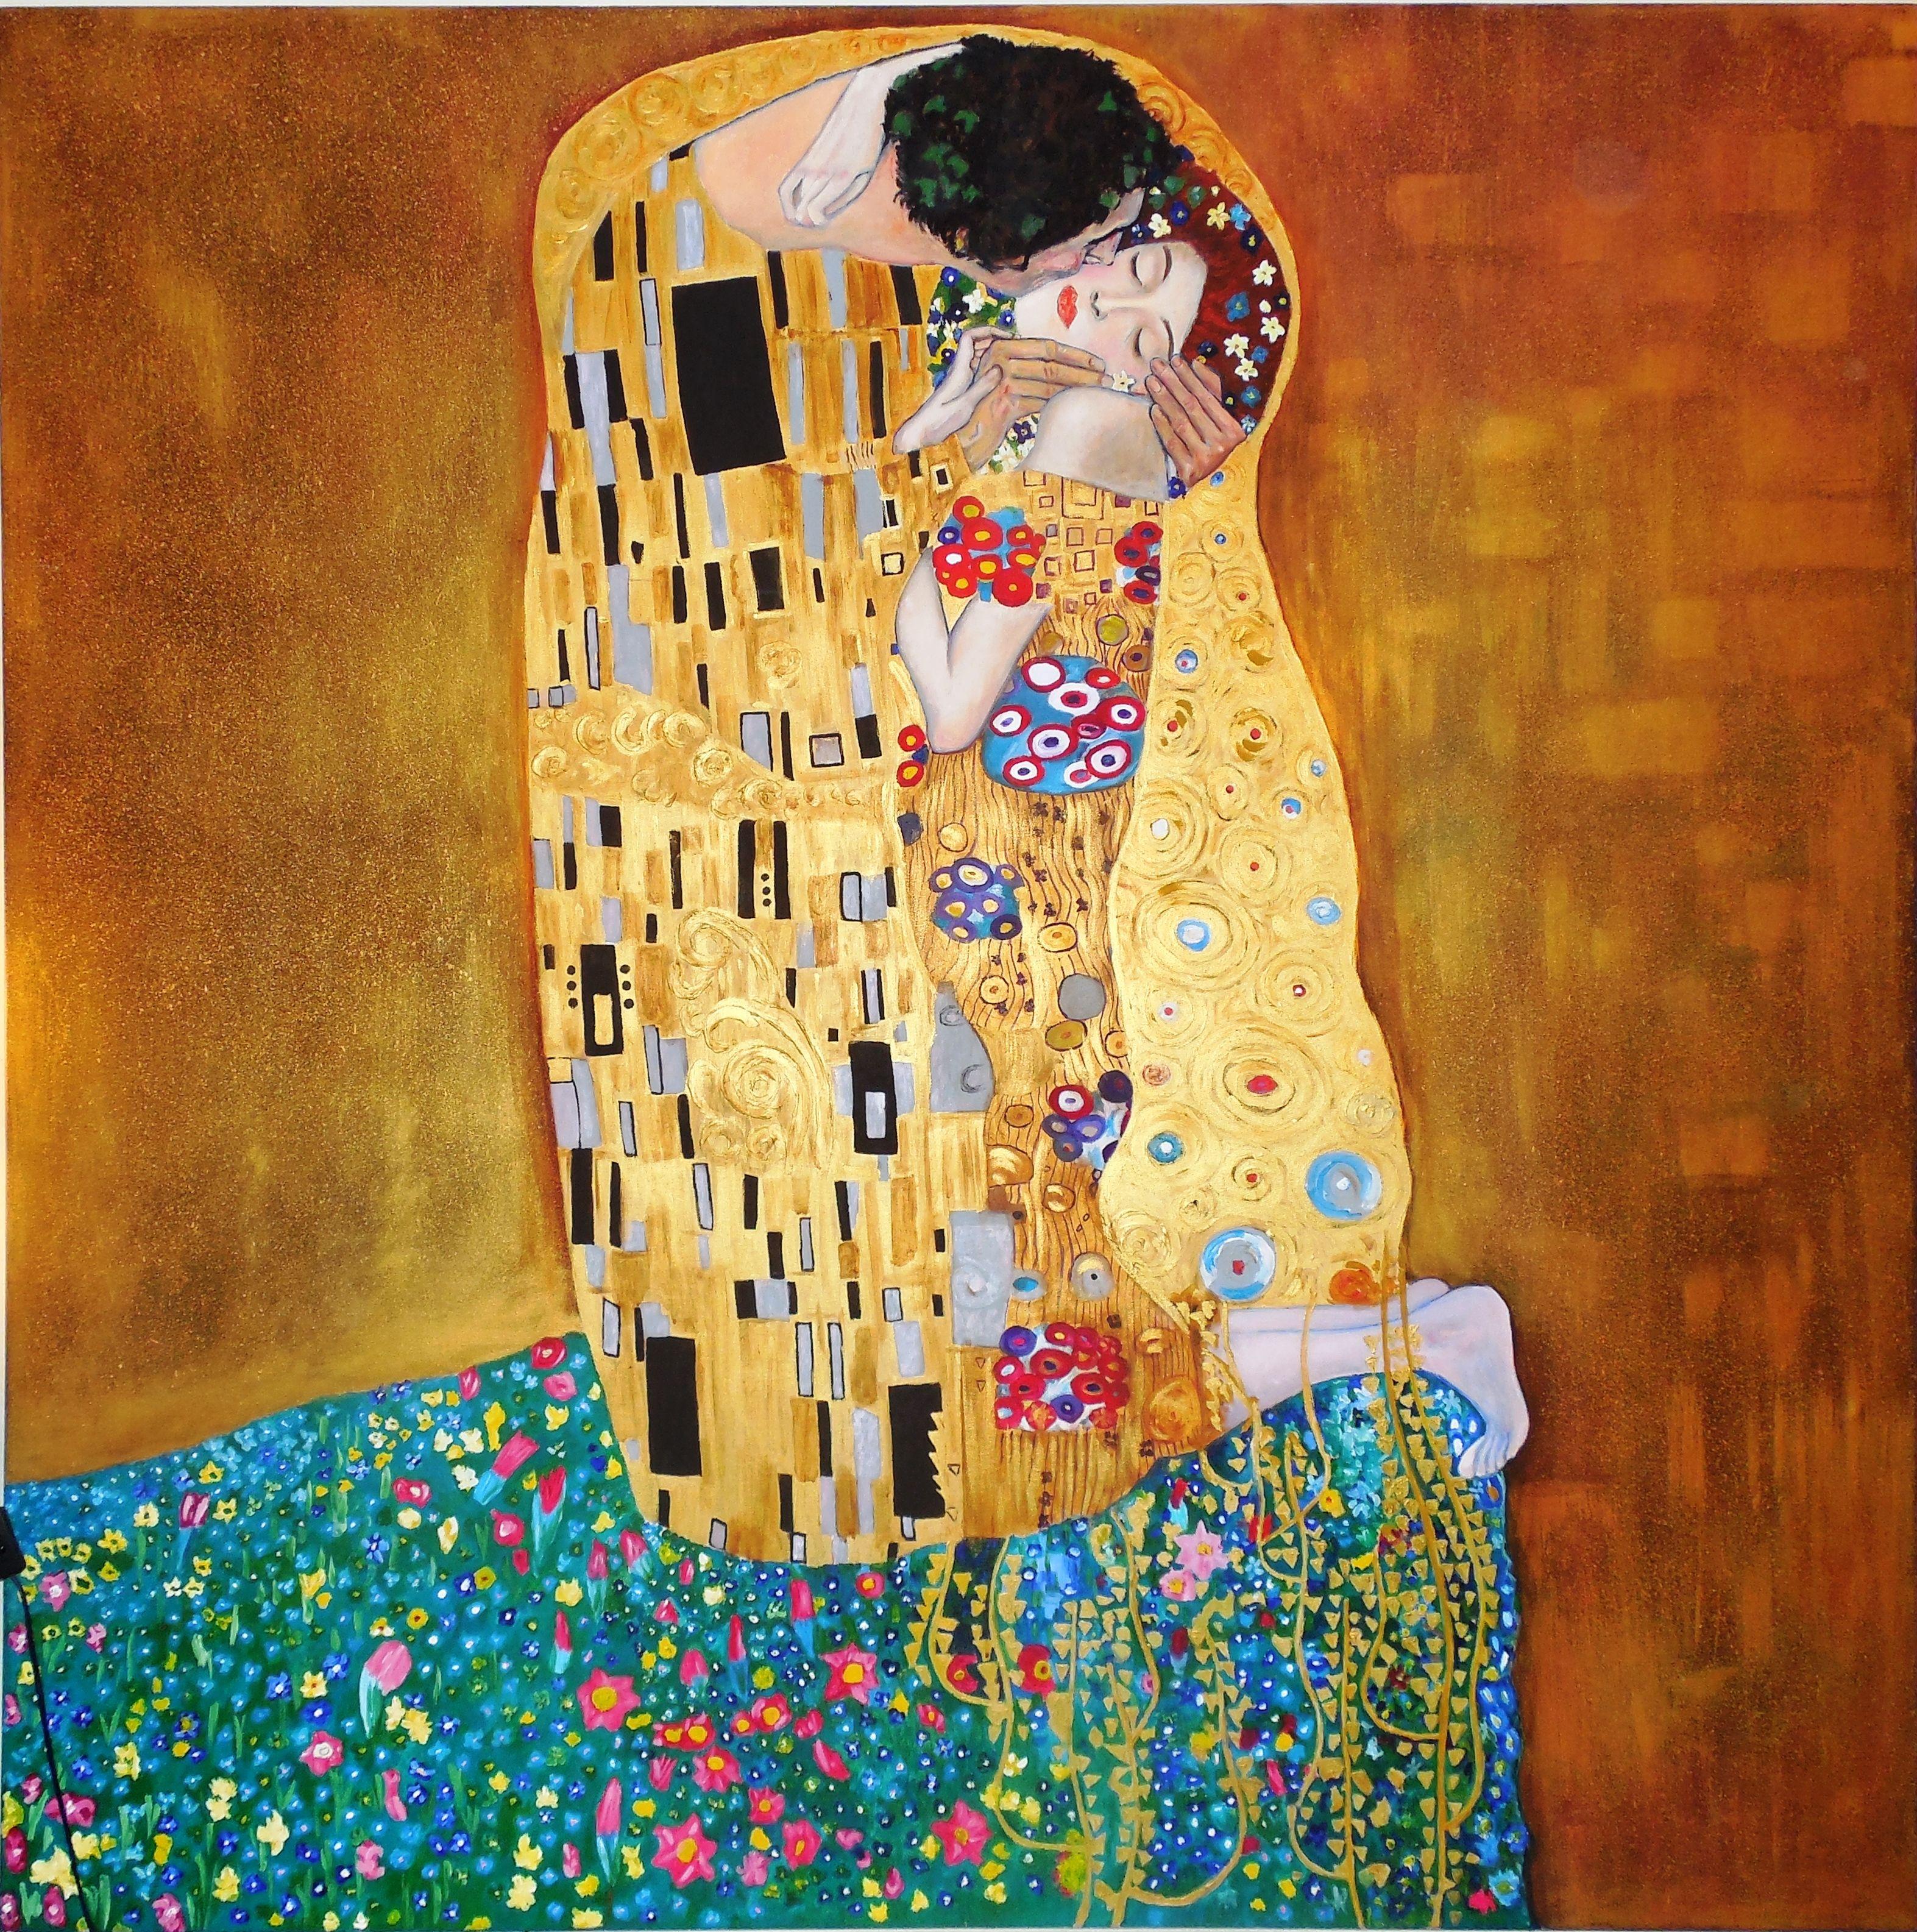 El Beso De Klimt Replica De Tamaño Exacto Del Original 180 Cms X 180 Cms Gema Silva Técnica Mixta Acrílico óleo Pasta A Klimt El Beso Gustav Klimt Klimt